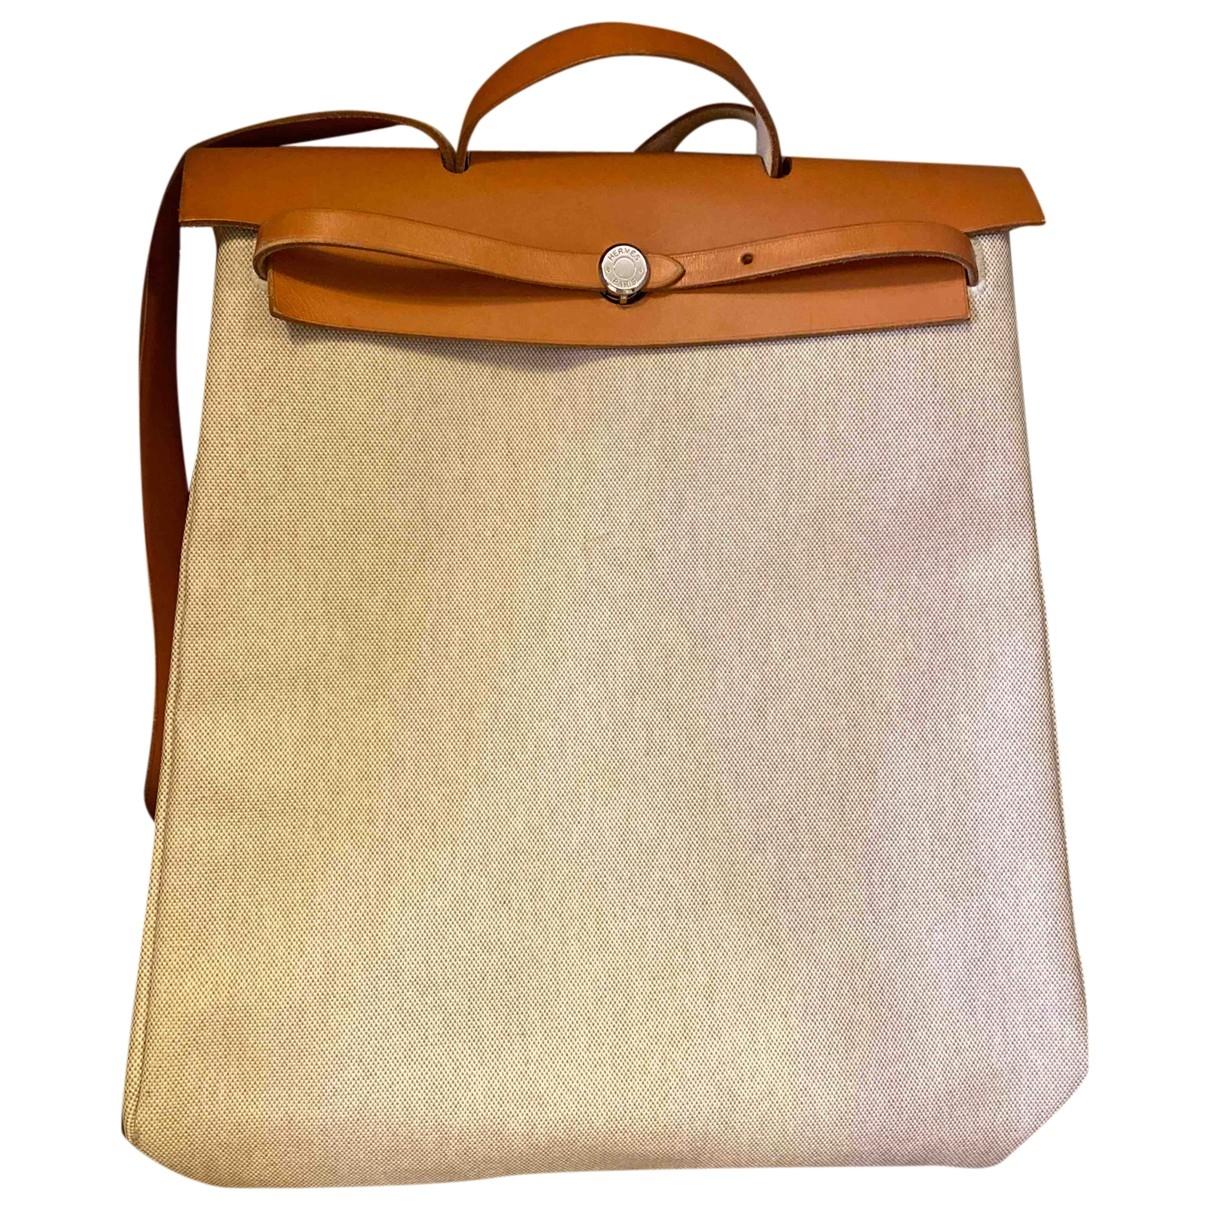 Hermes - Sac de voyage Herbag pour femme en toile - beige